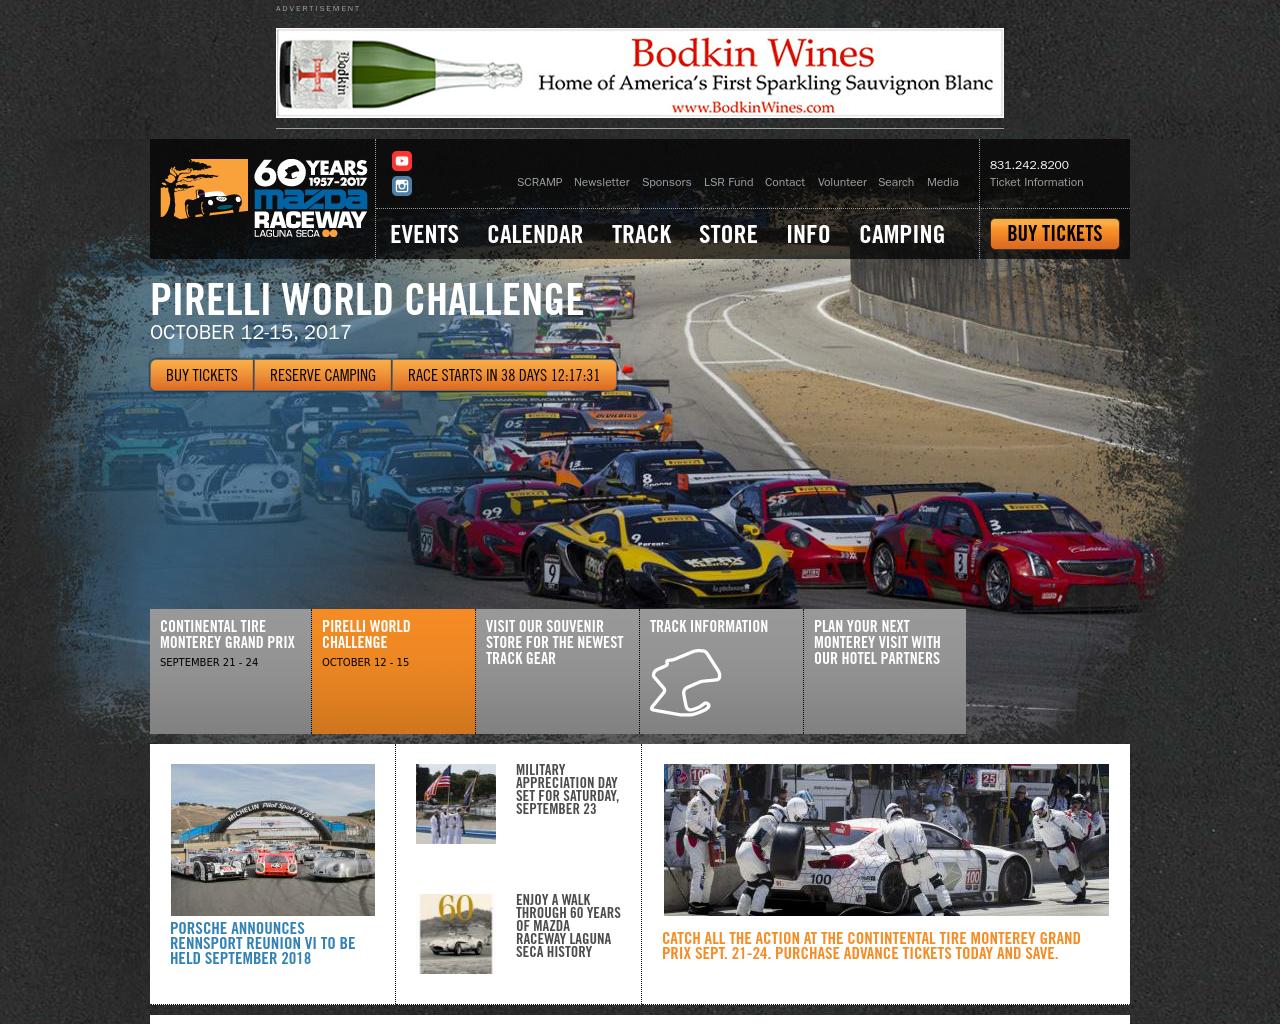 Mazda-Raceway-Advertising-Reviews-Pricing